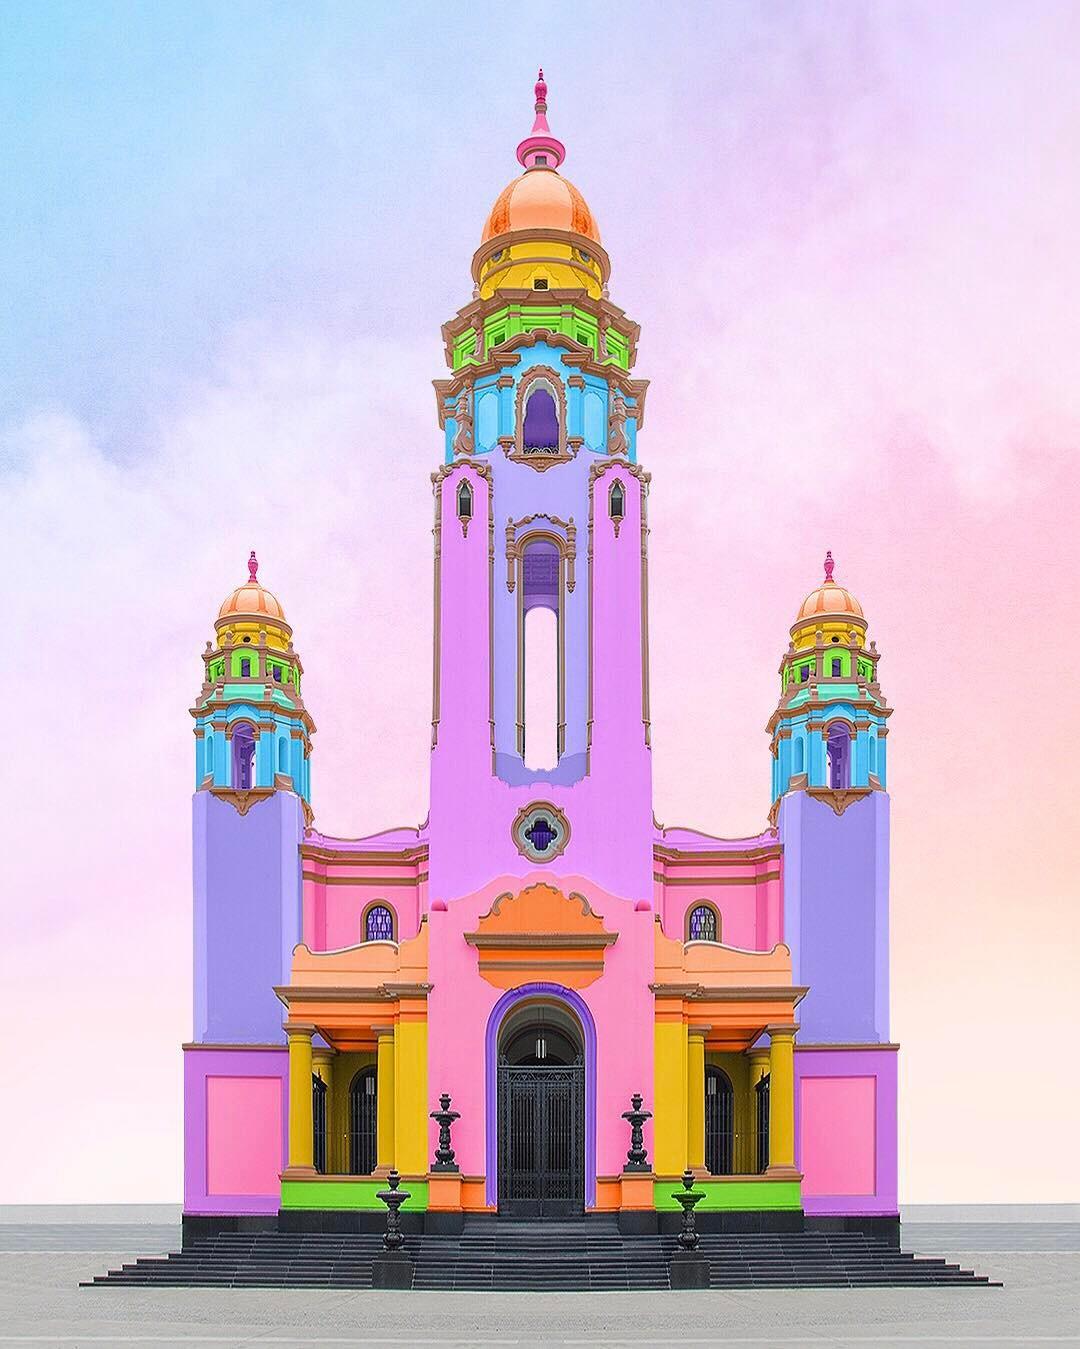 Ярче радуги: красочные фотографии от Рамзи Марси (Ramzy Masri)